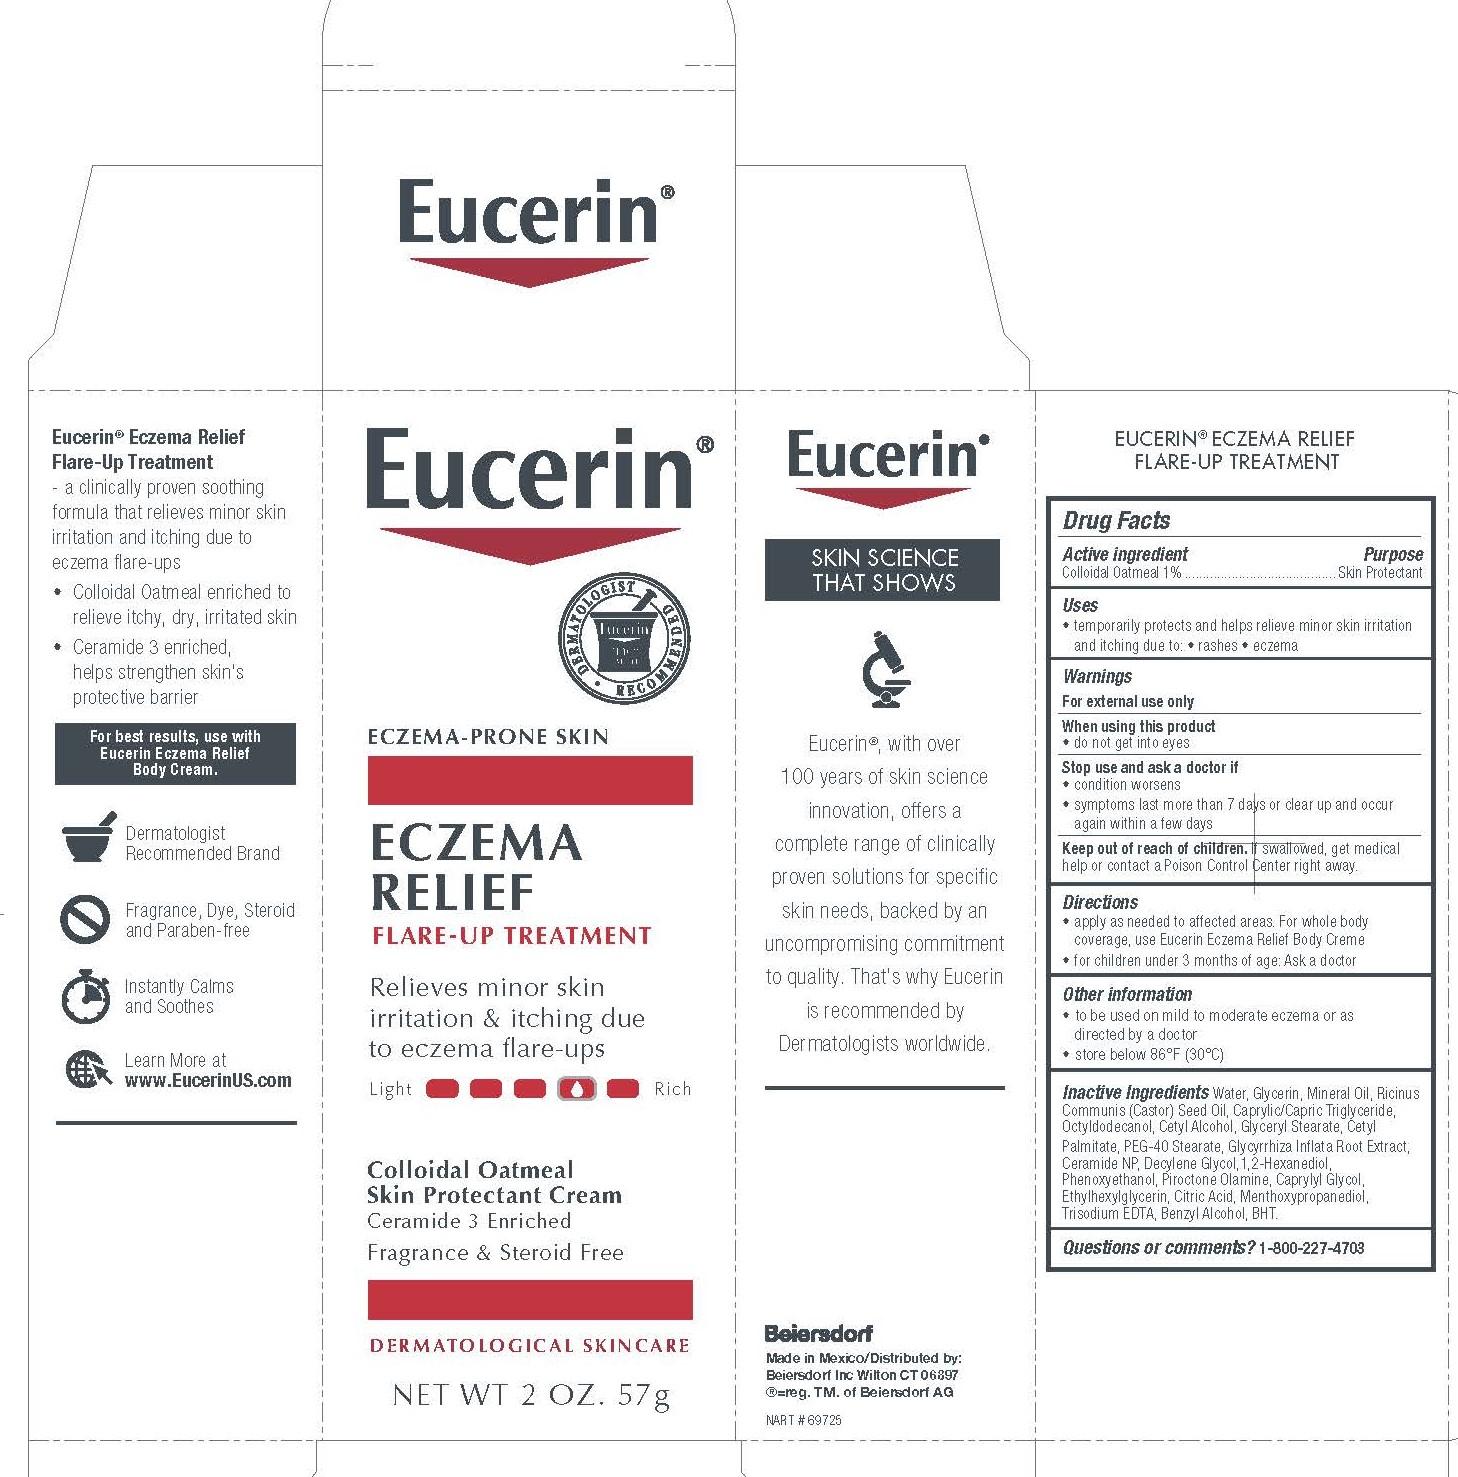 eczemaflareupcream